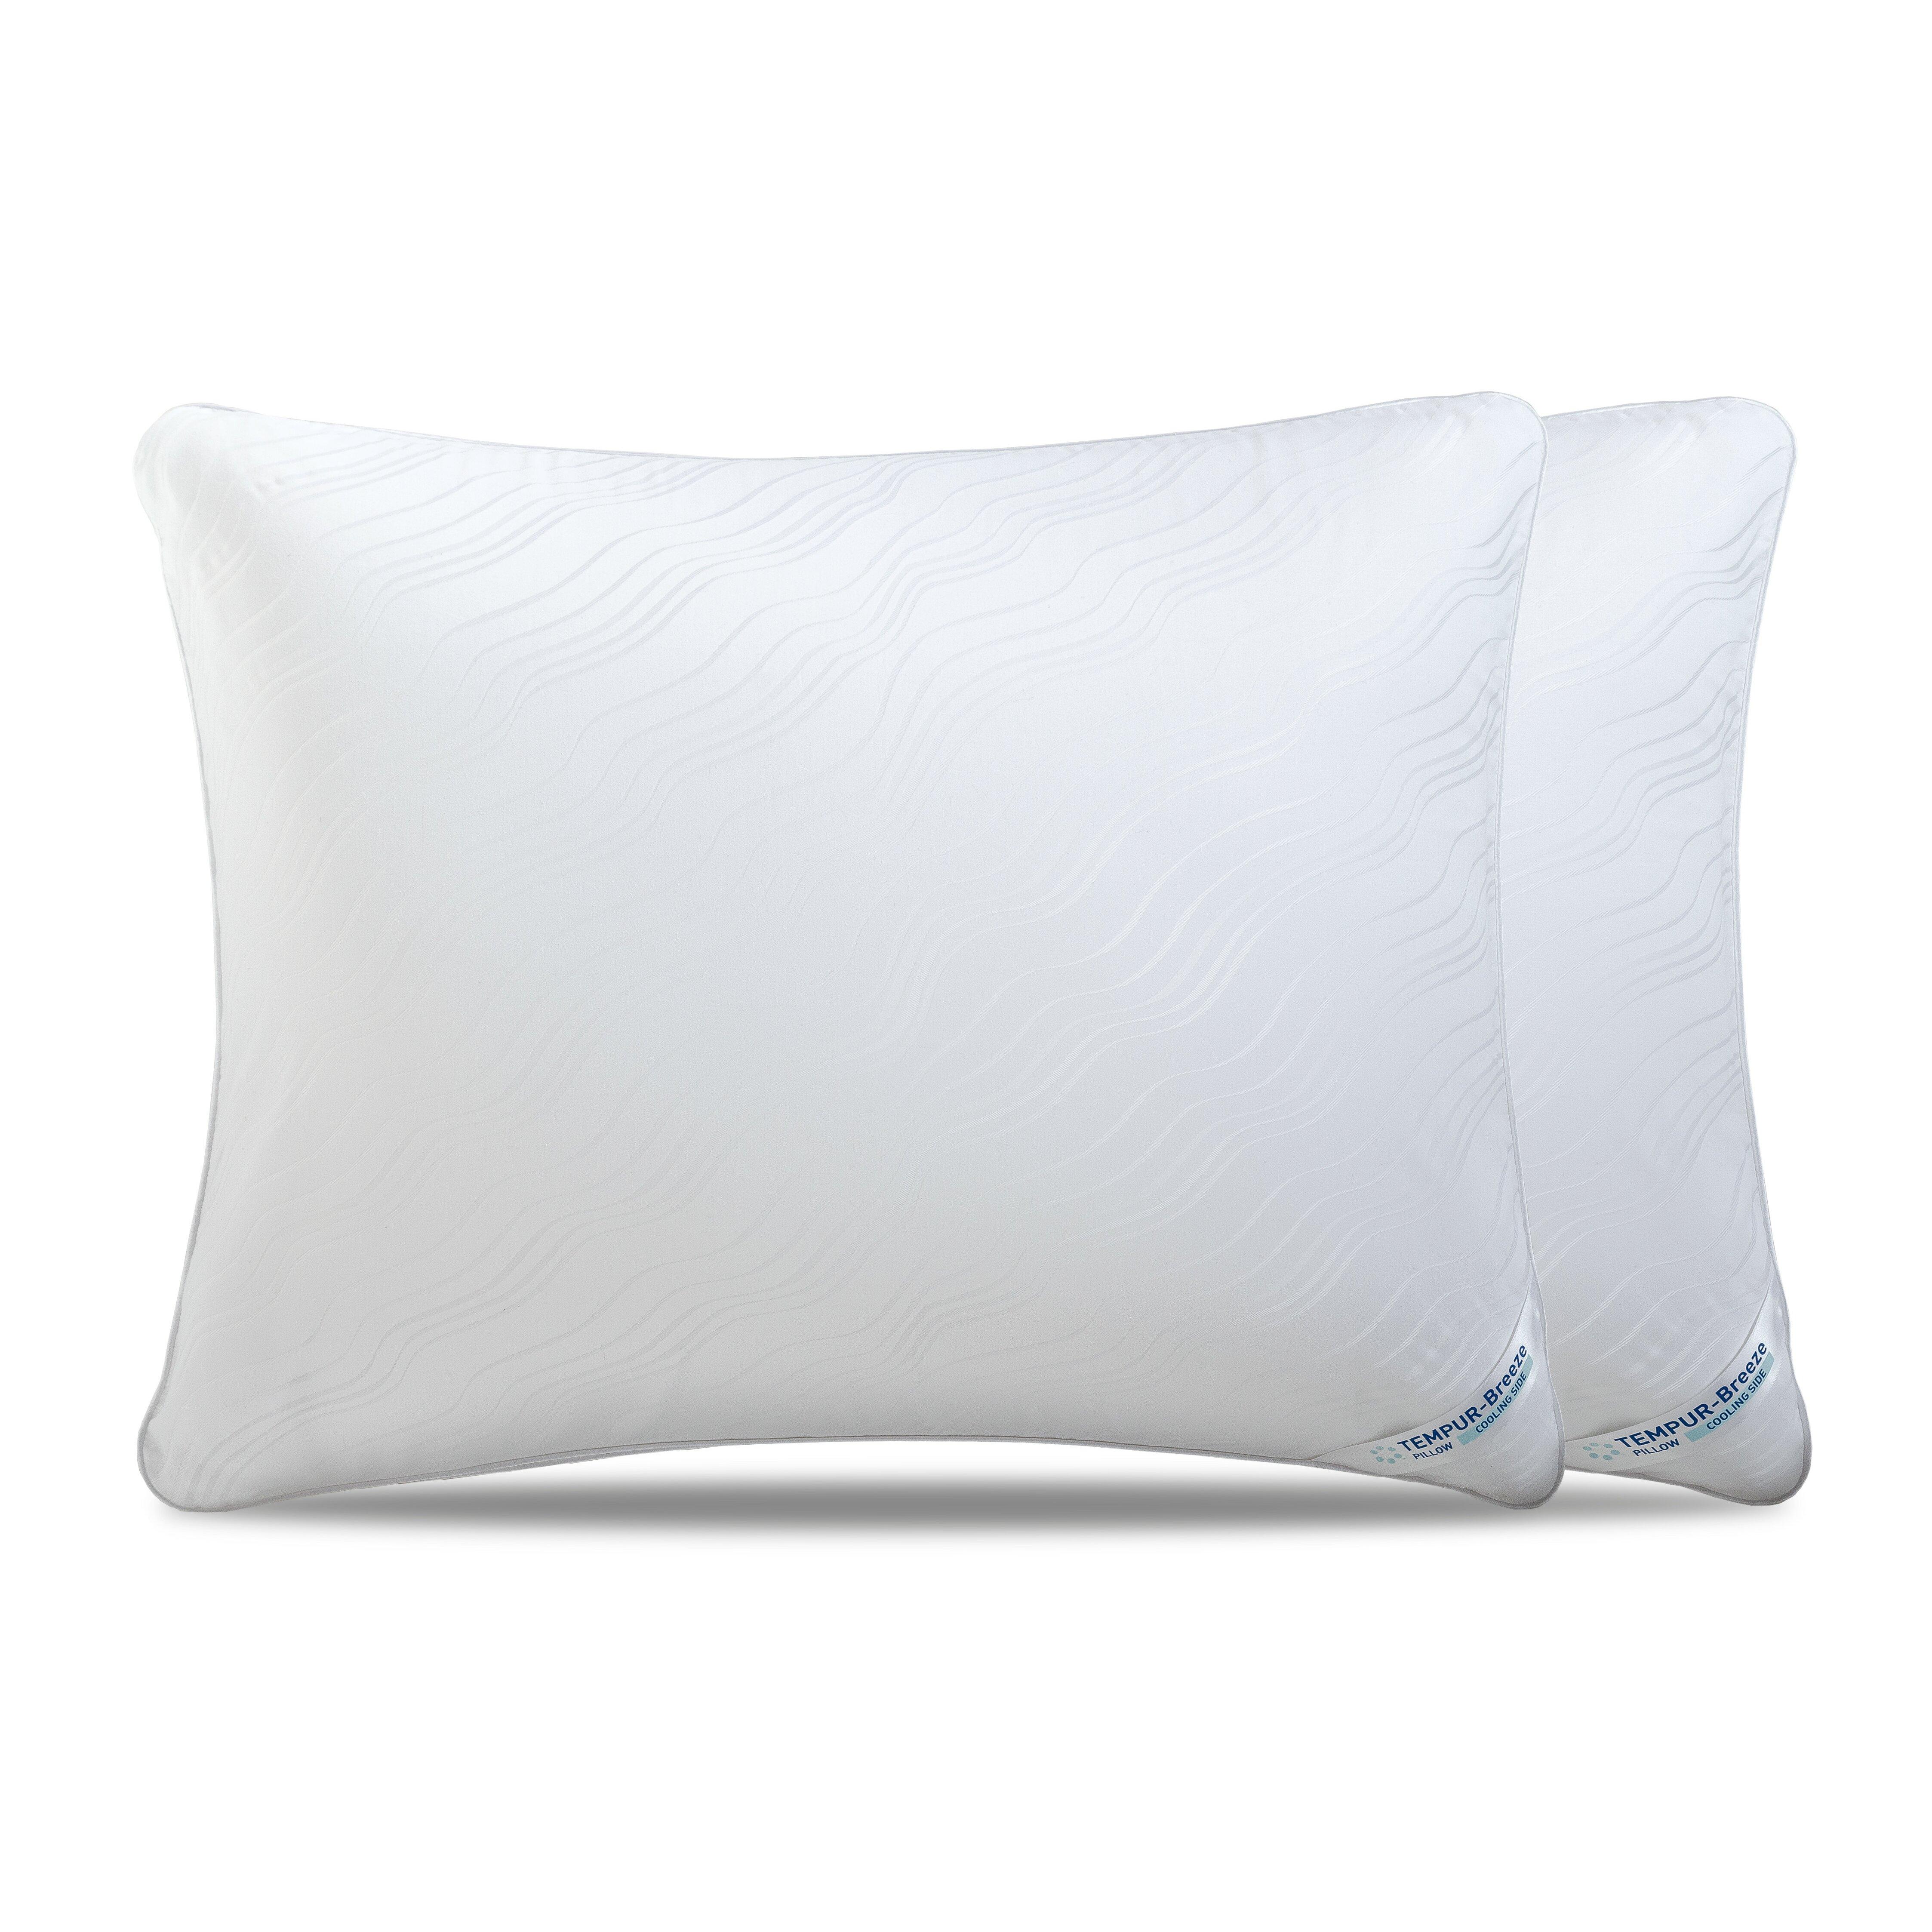 Tempur Traditional Memory Foam Pillow : Tempur-Pedic Breeze Memory Foam Pillow & Reviews Wayfair